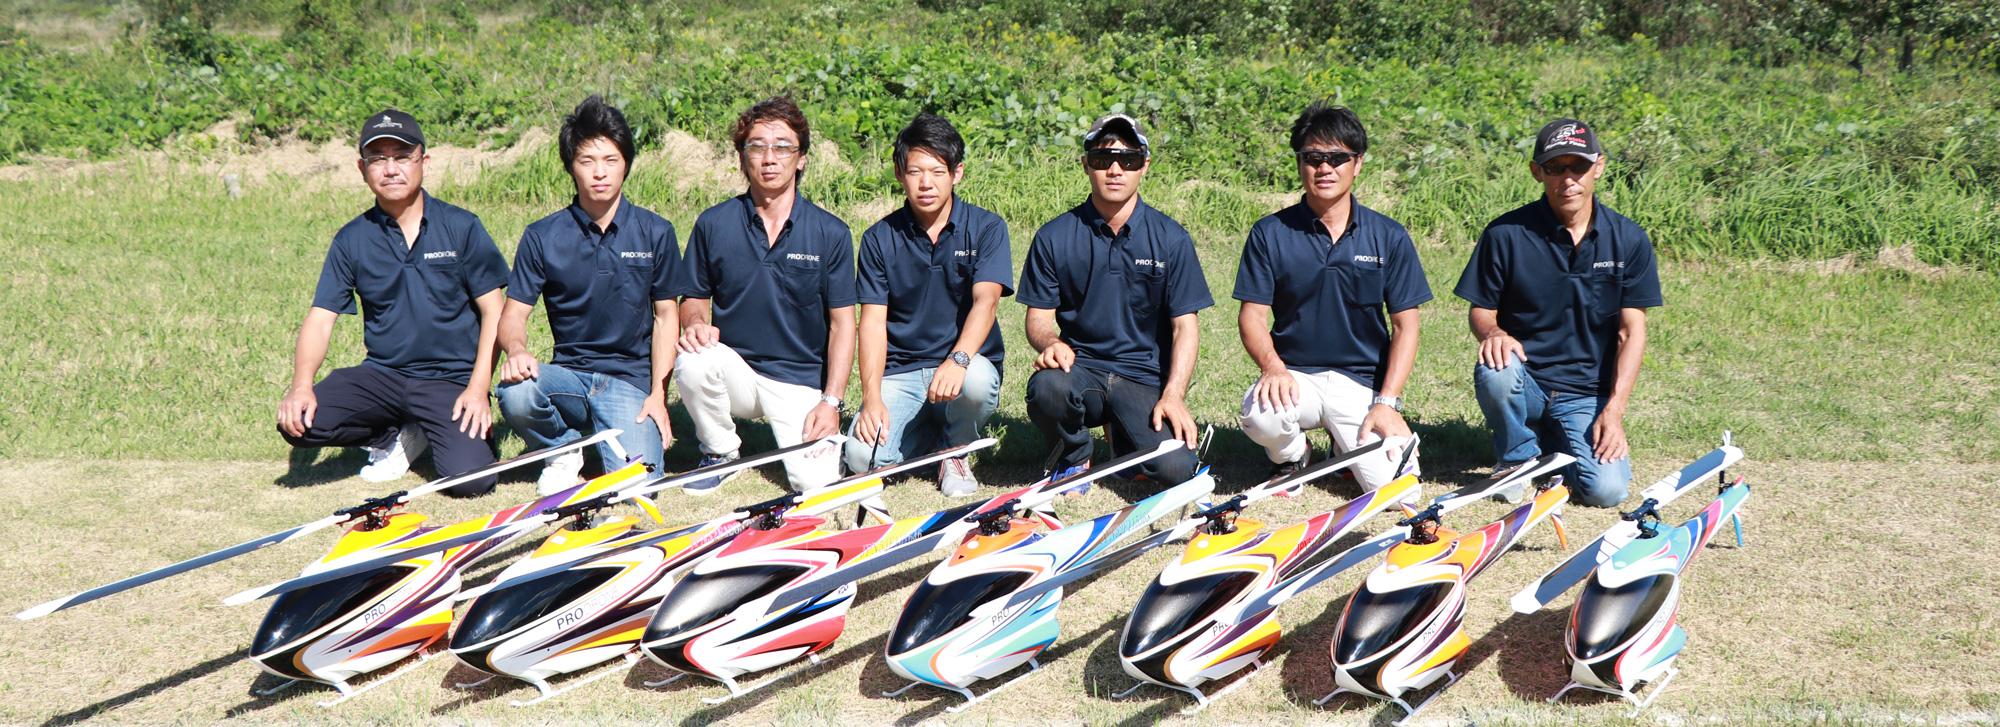 F3C日本選手権2018の選手画像